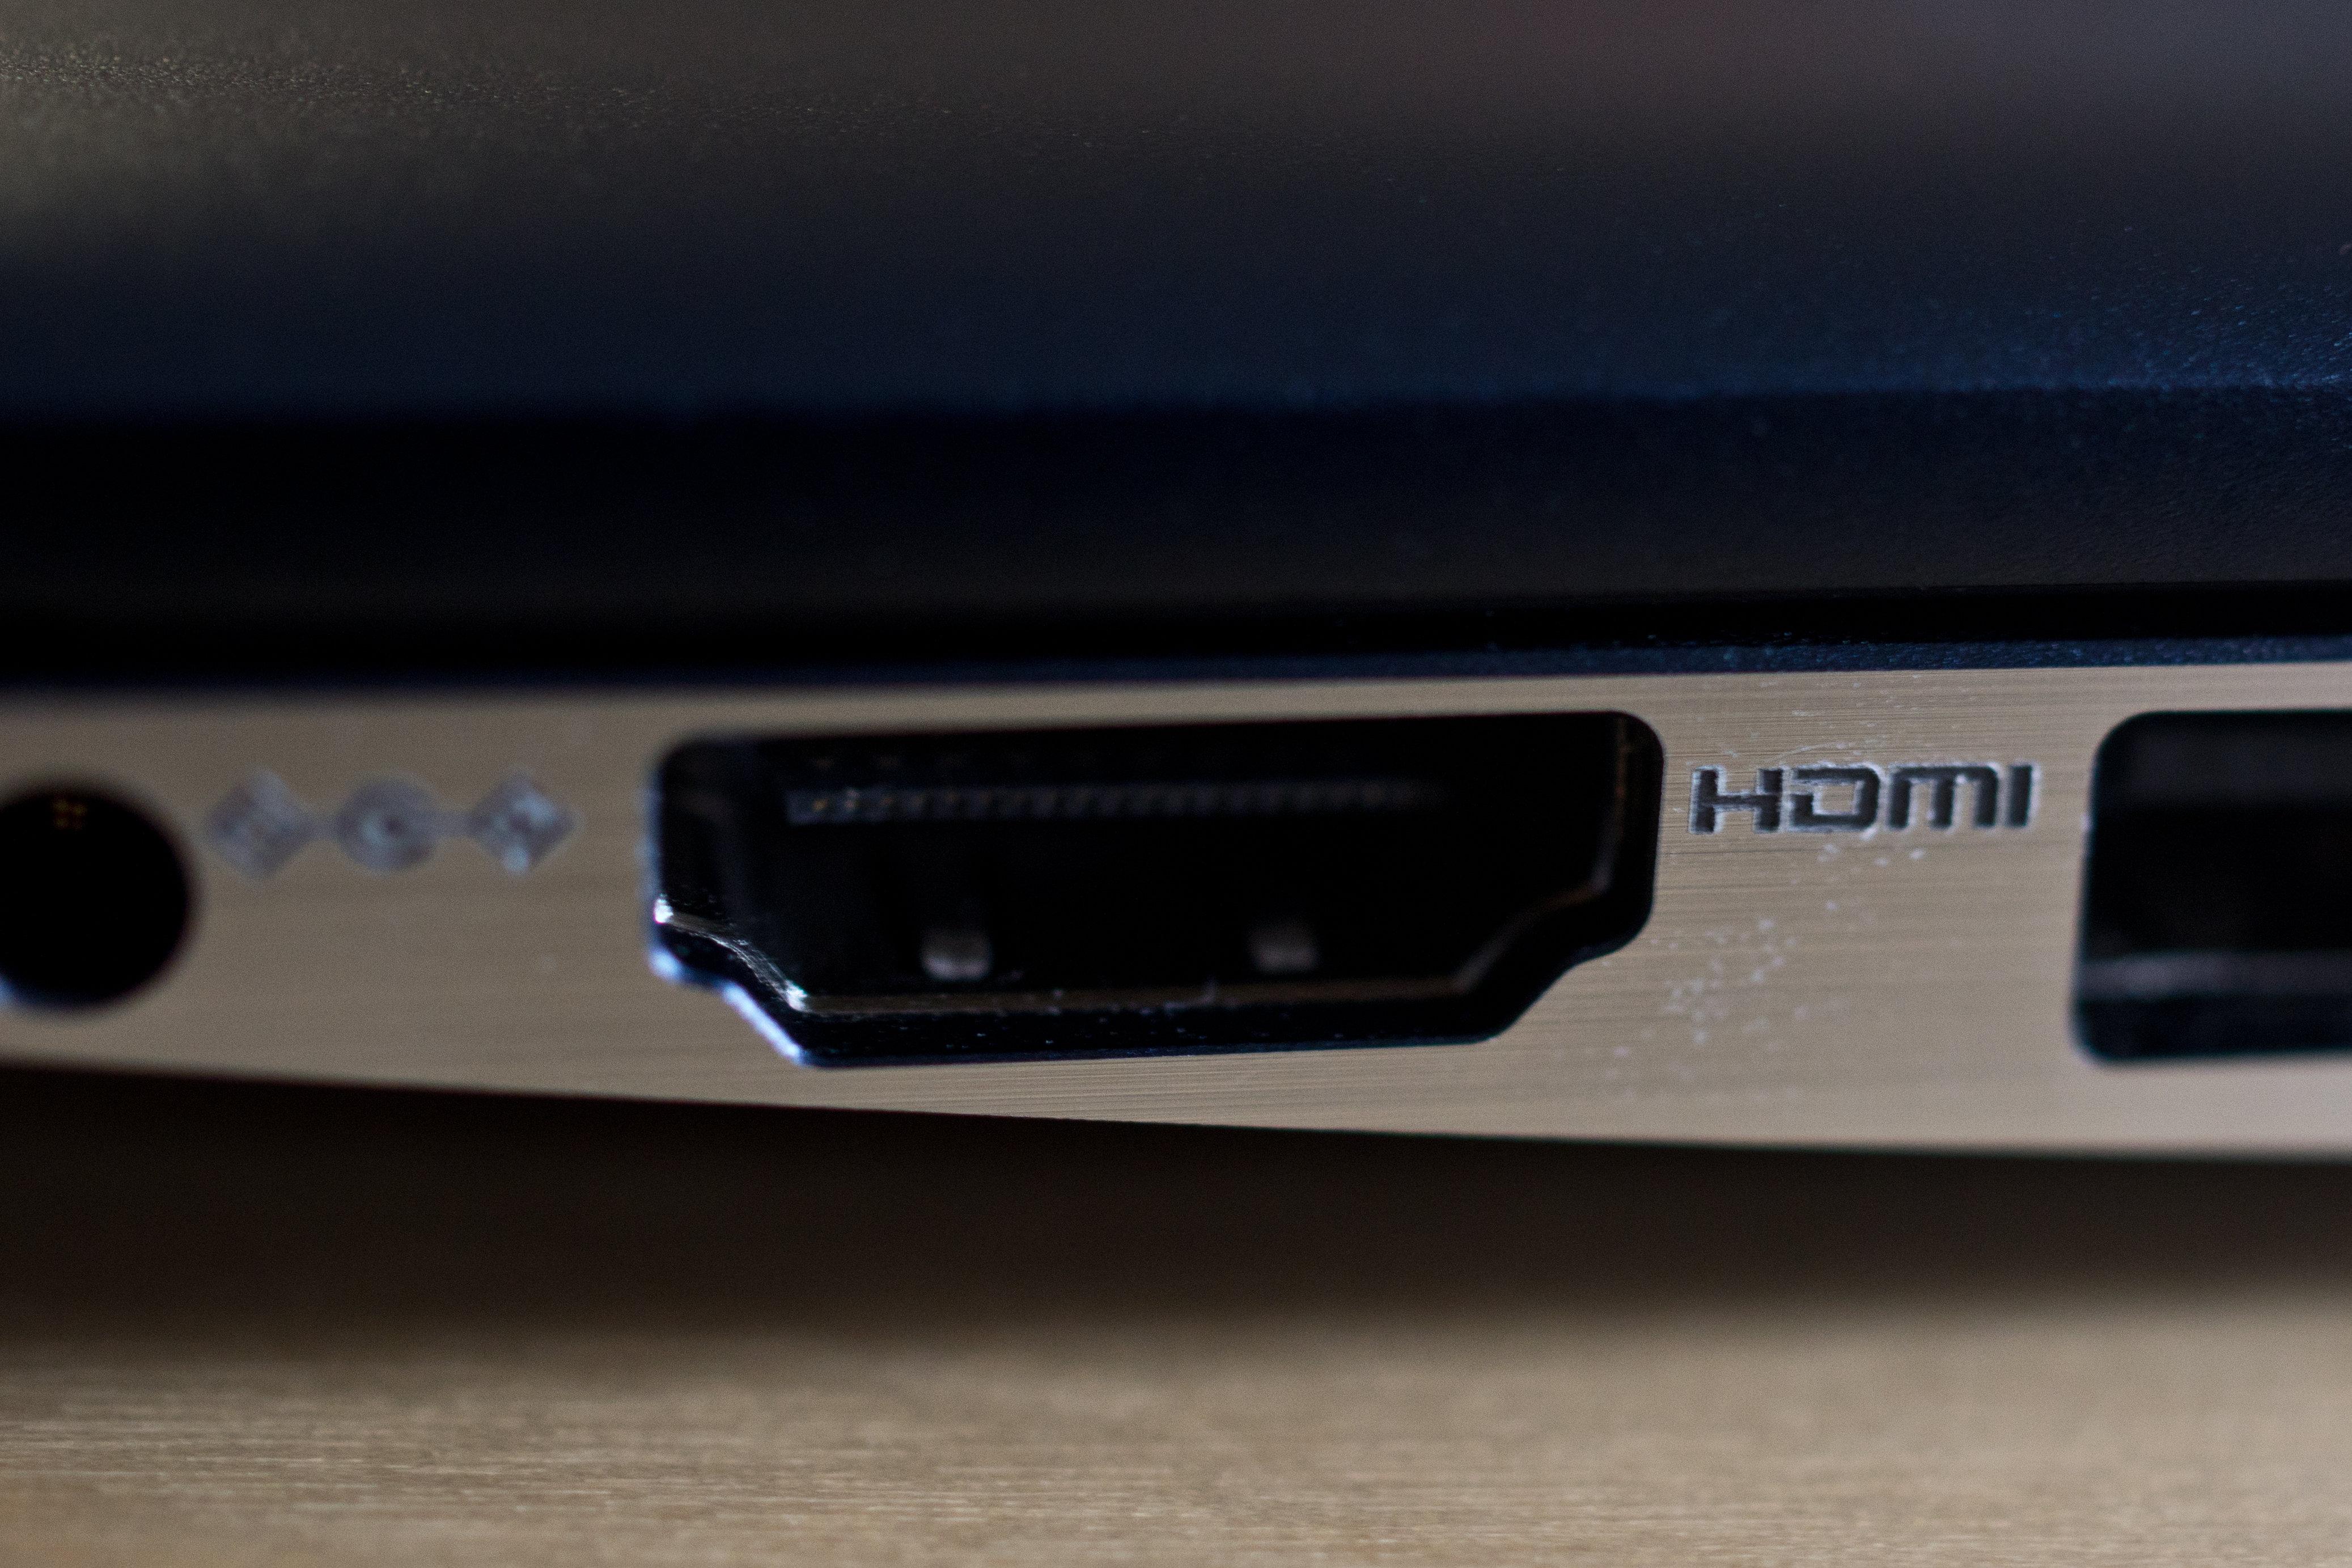 A photograph of the Samsung ATIV Book 9 2014 Edition's HDMI port.